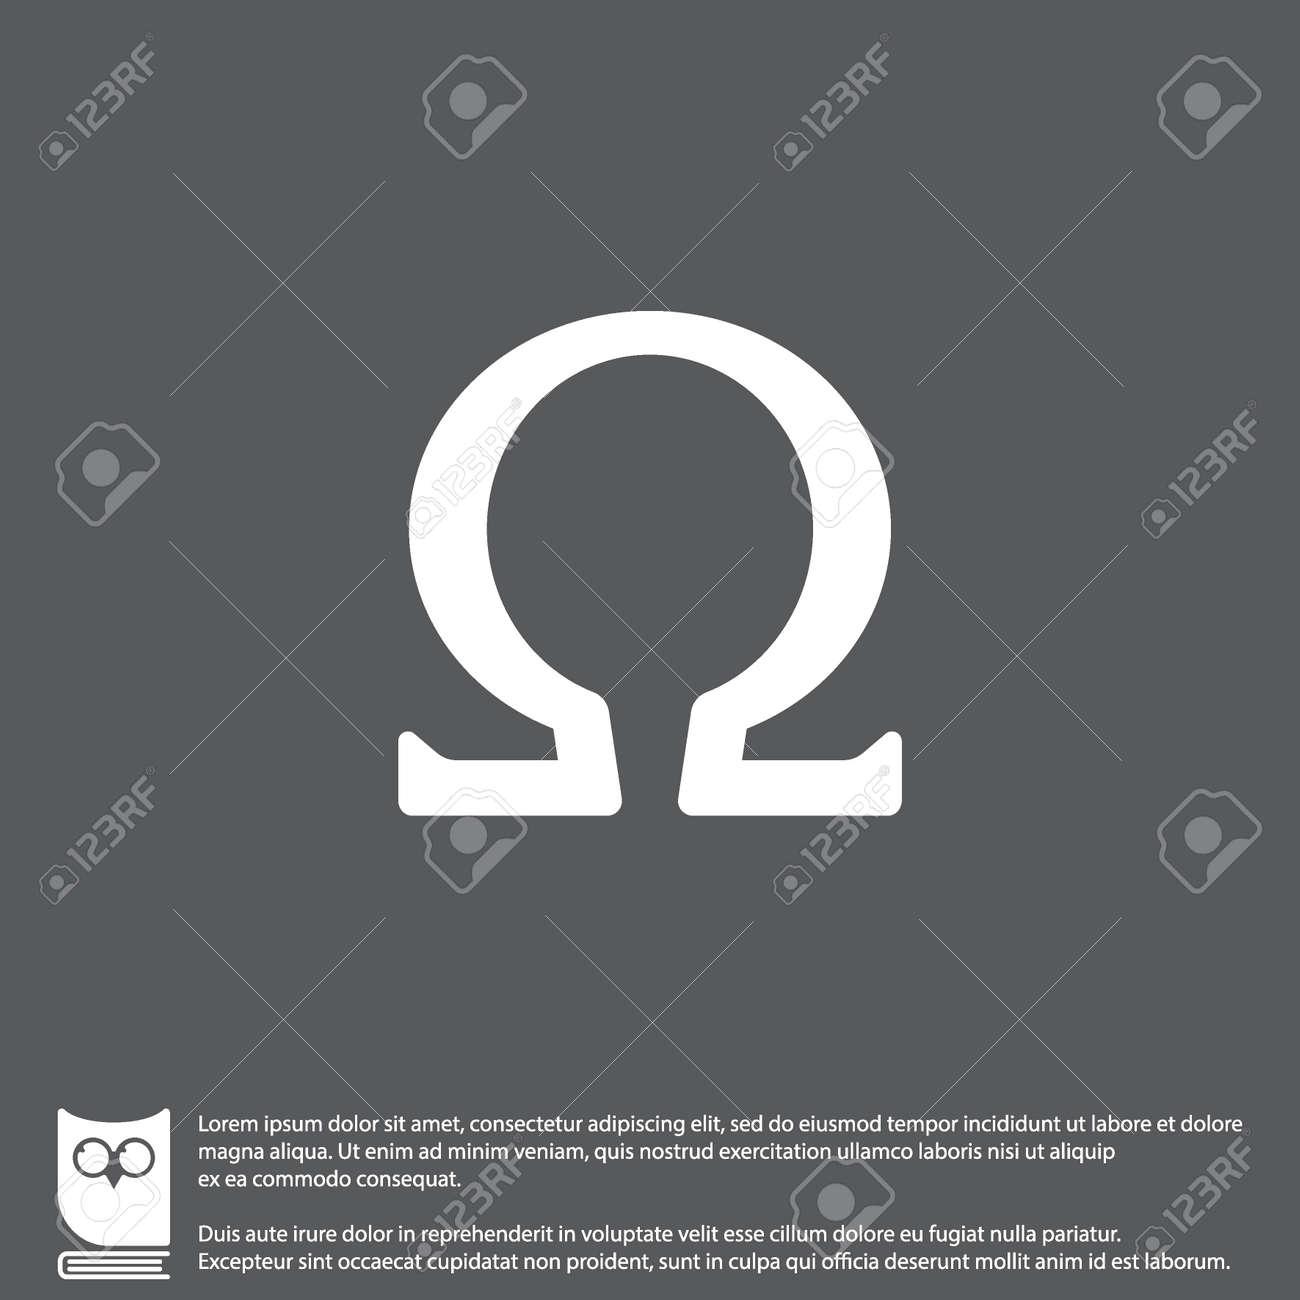 Icono De Web. Símbolo Omega Ilustraciones Vectoriales, Clip Art ...